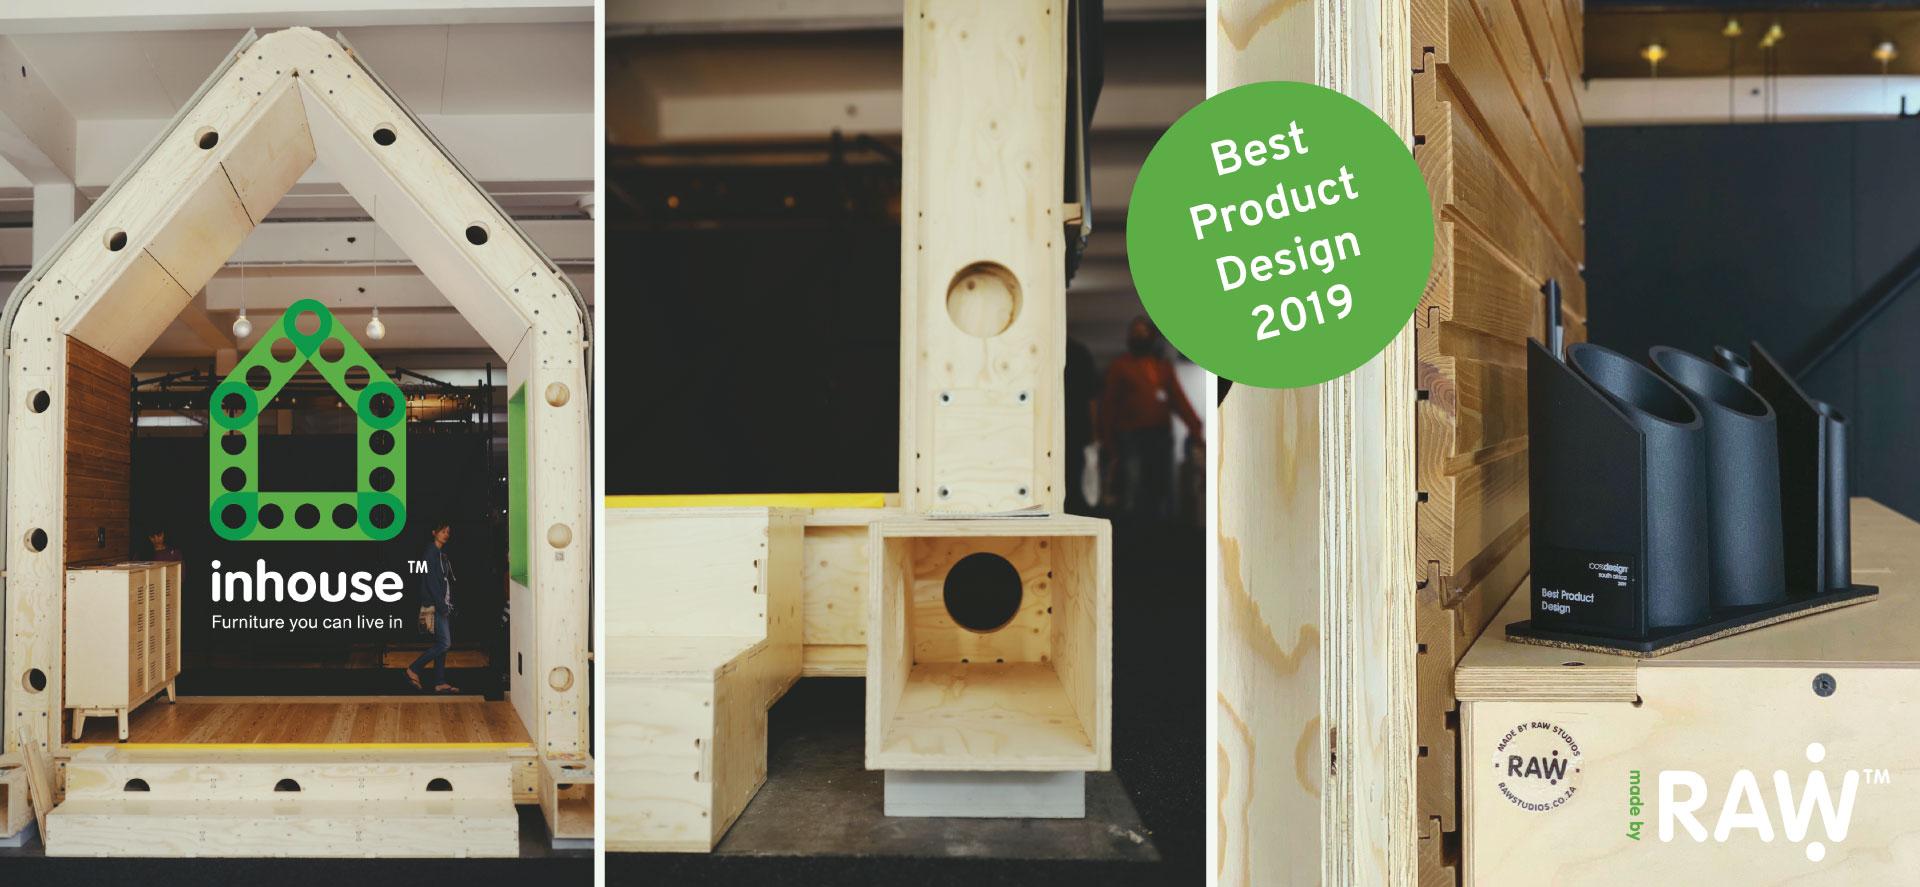 RAW Studios 100% Design 2019 Best Product Design Award Inhouse: Plywood Home